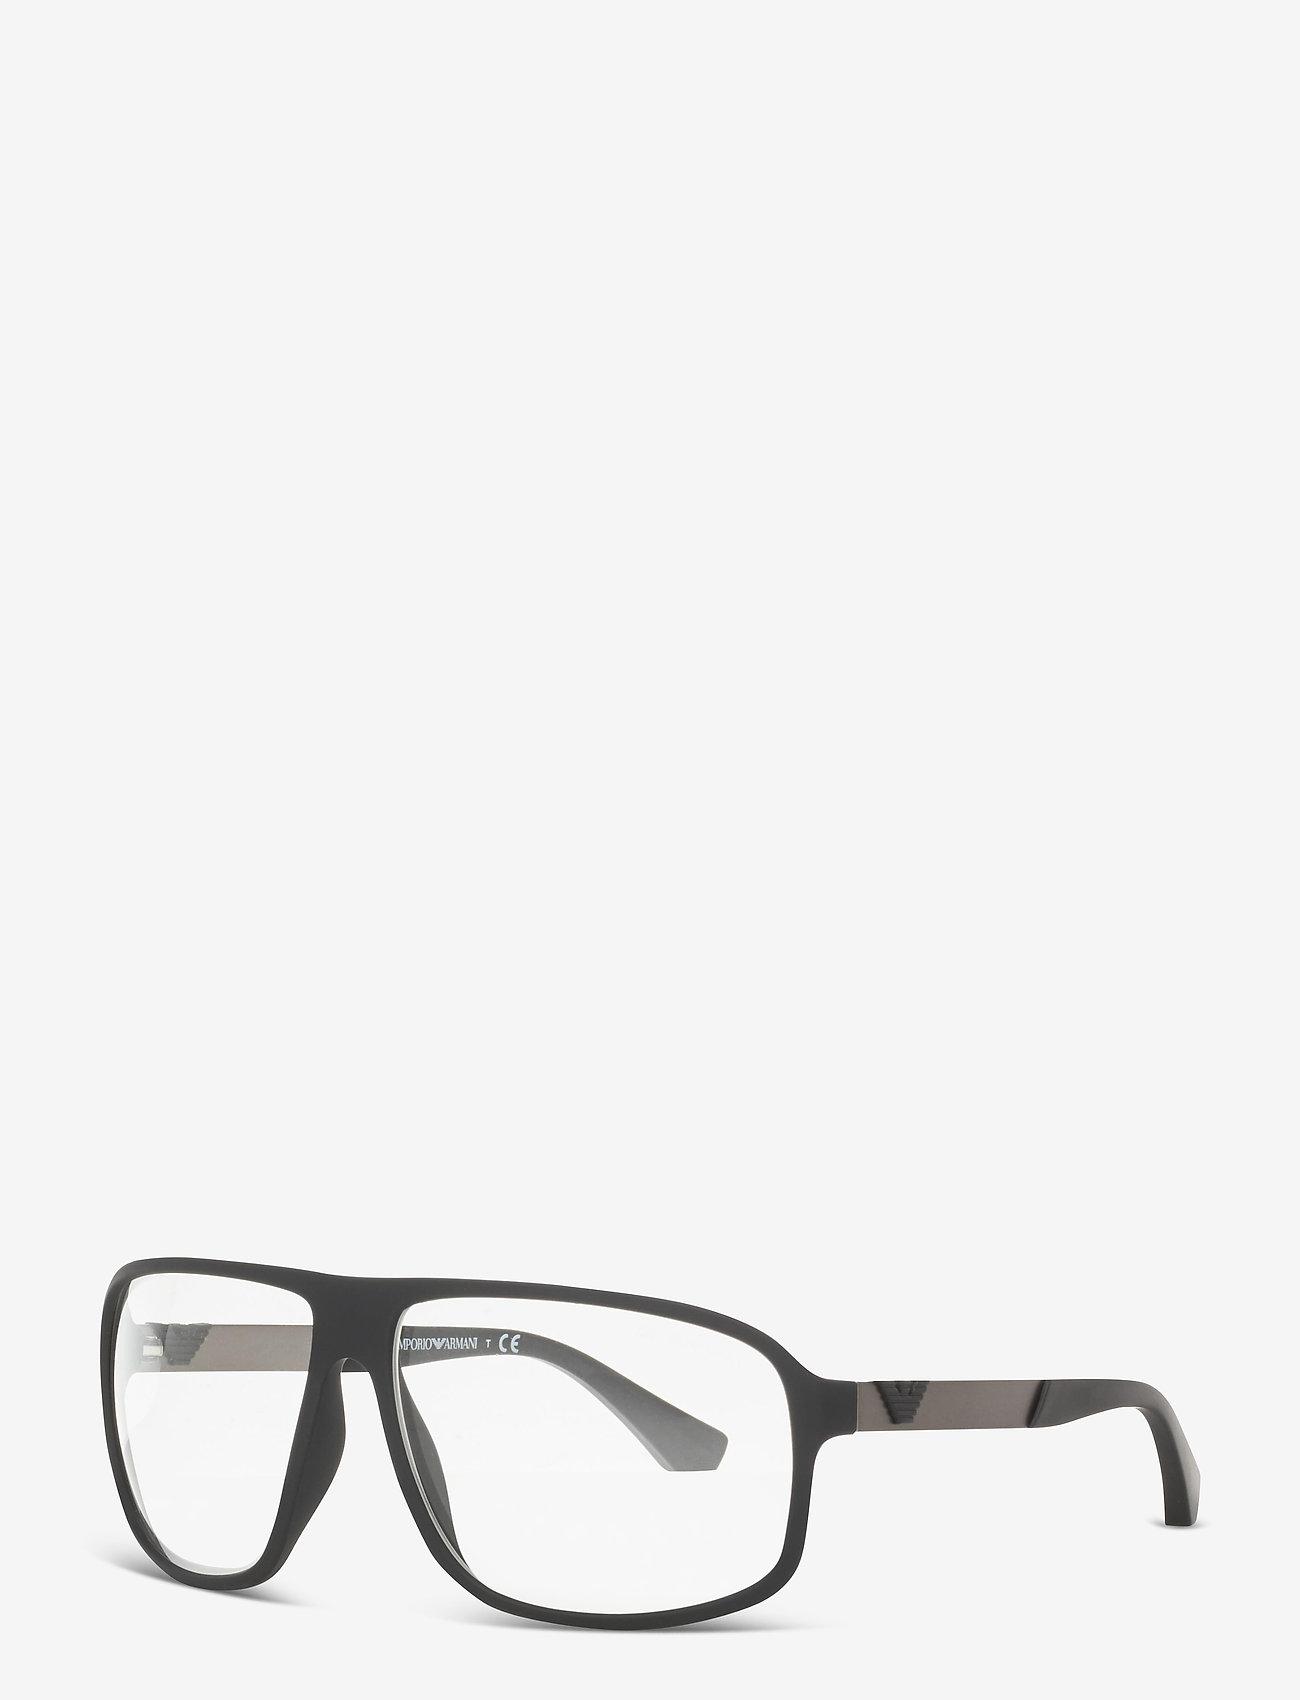 Emporio Armani Sunglasses - Sunglasses - d-shaped - clear - 1